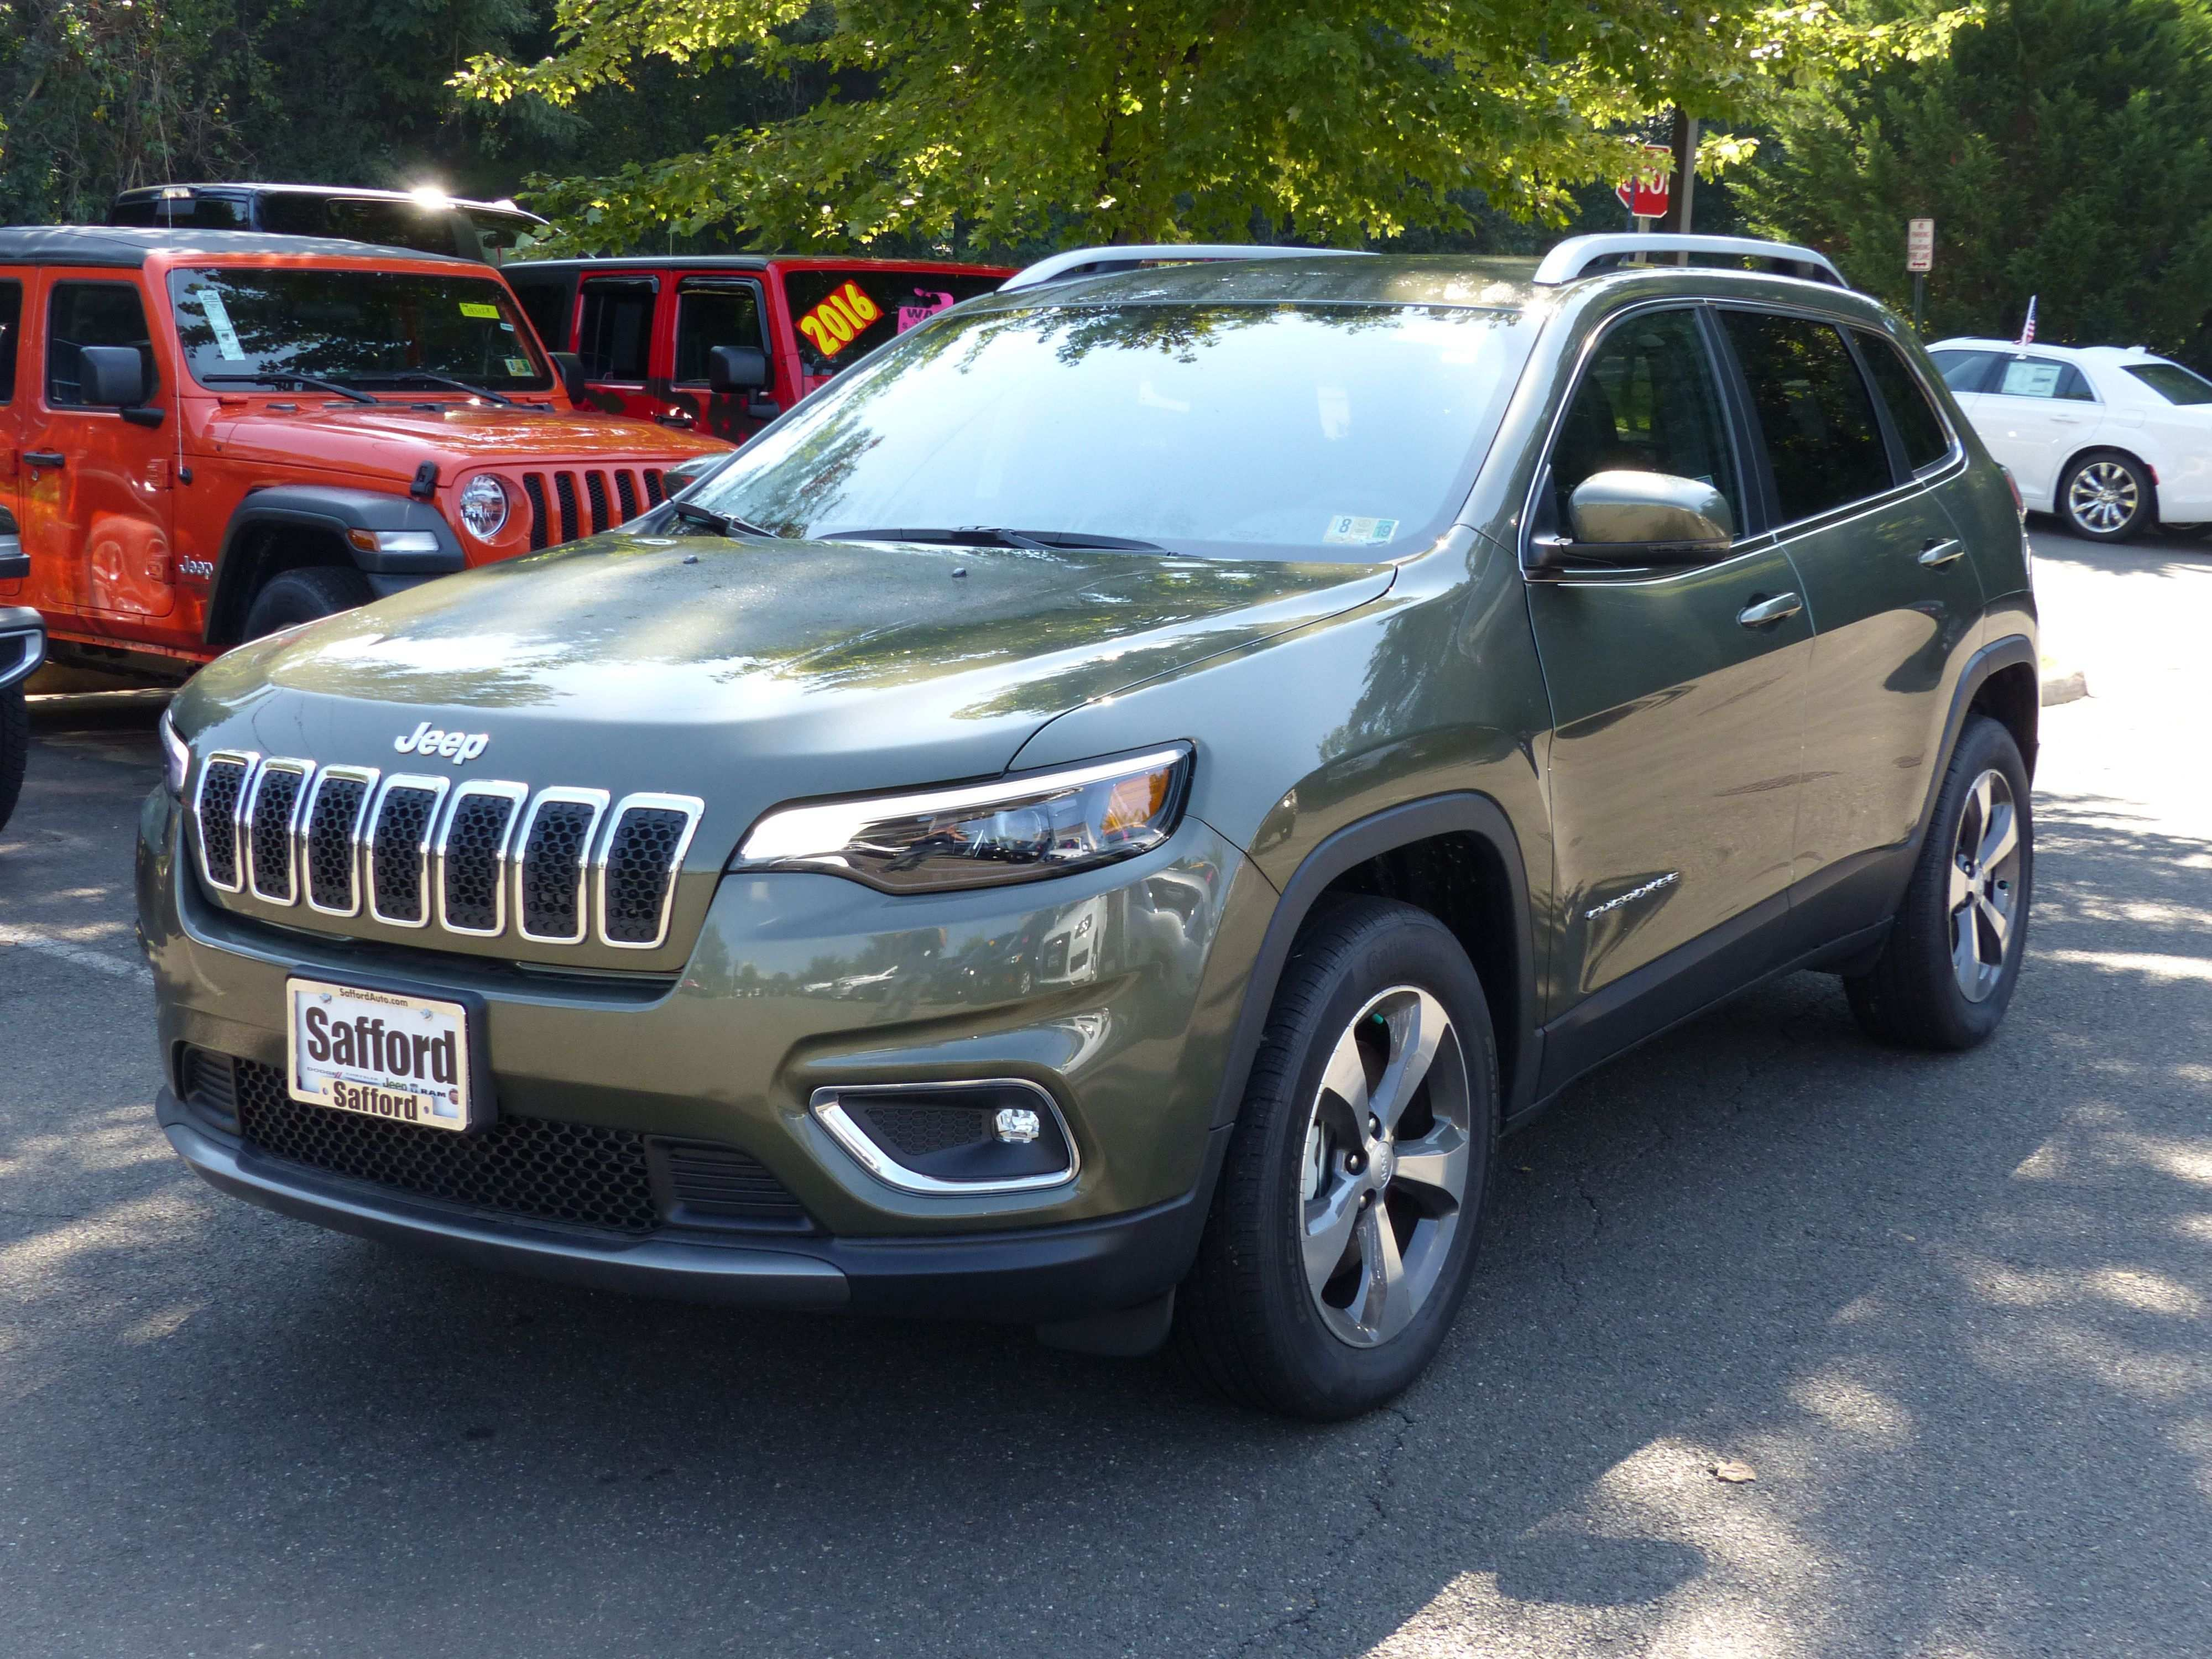 53 New Best Jeep Cherokee 2019 Anti Theft Code Exterior Price and Review for Best Jeep Cherokee 2019 Anti Theft Code Exterior